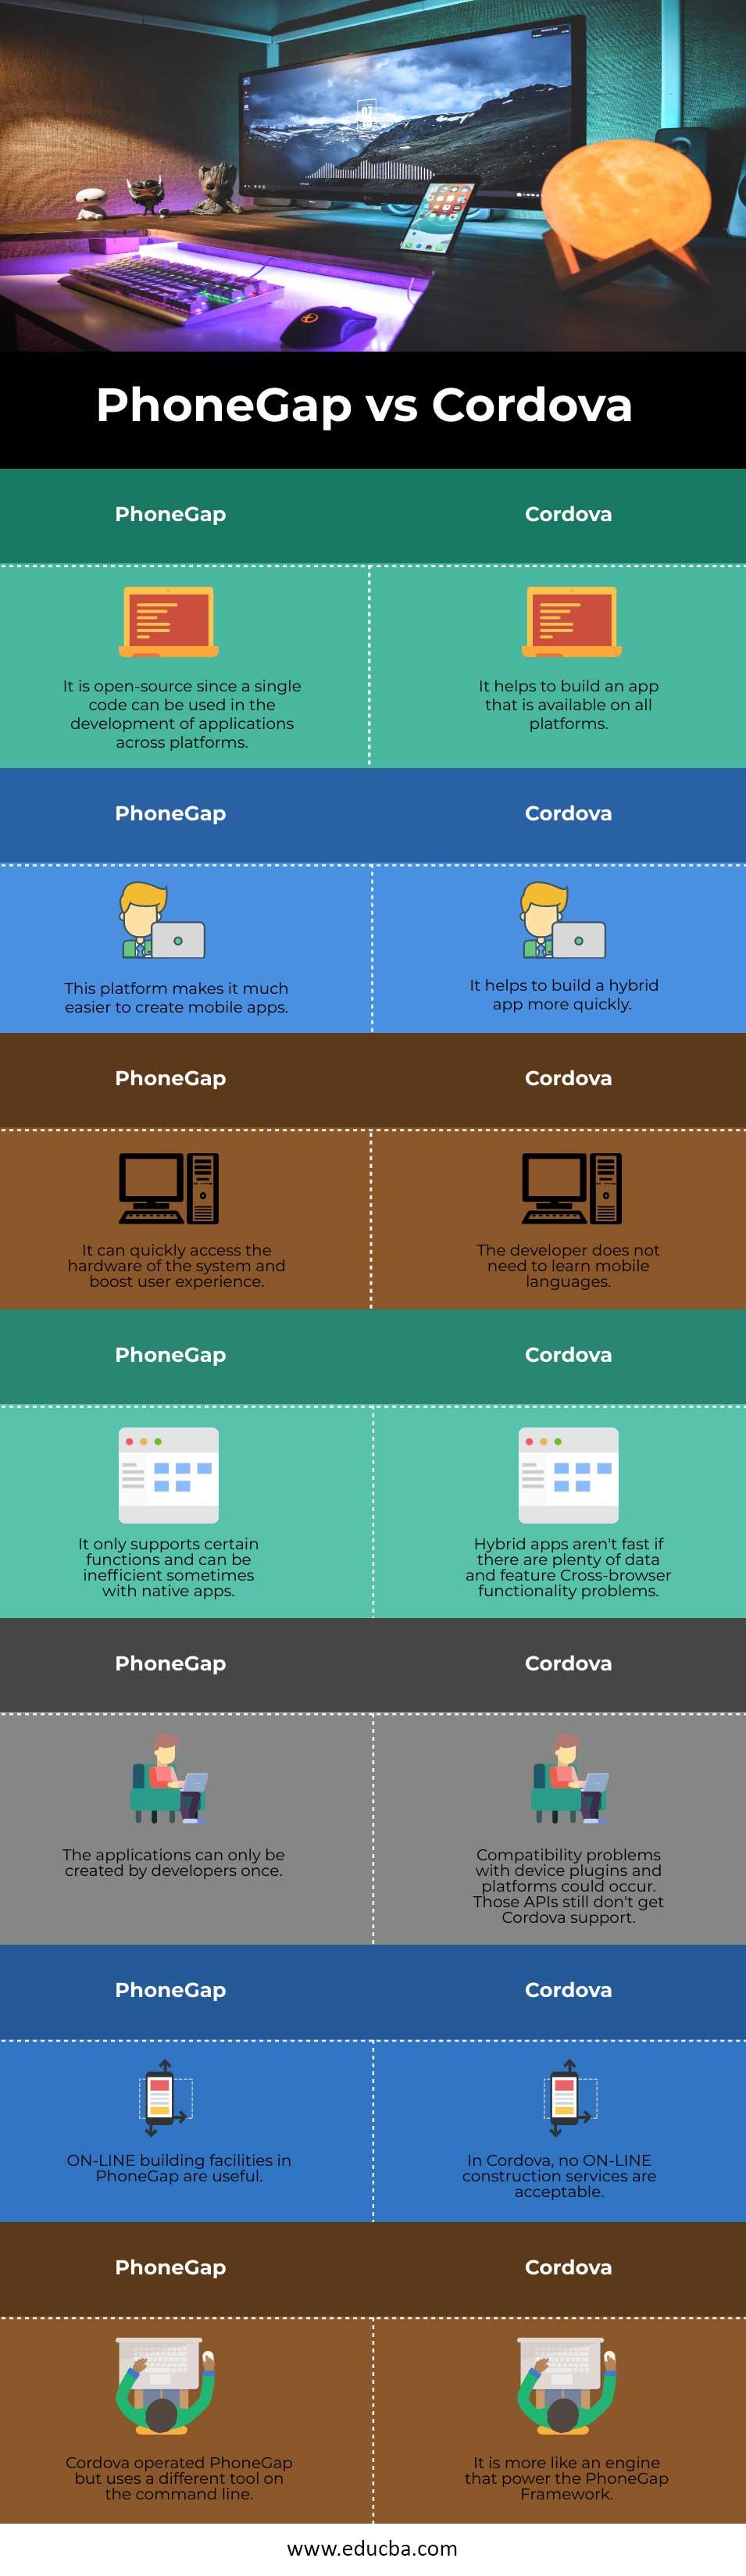 PhoneGap-vs-Cordova-infoPhoneGap-vs-Cordova-info